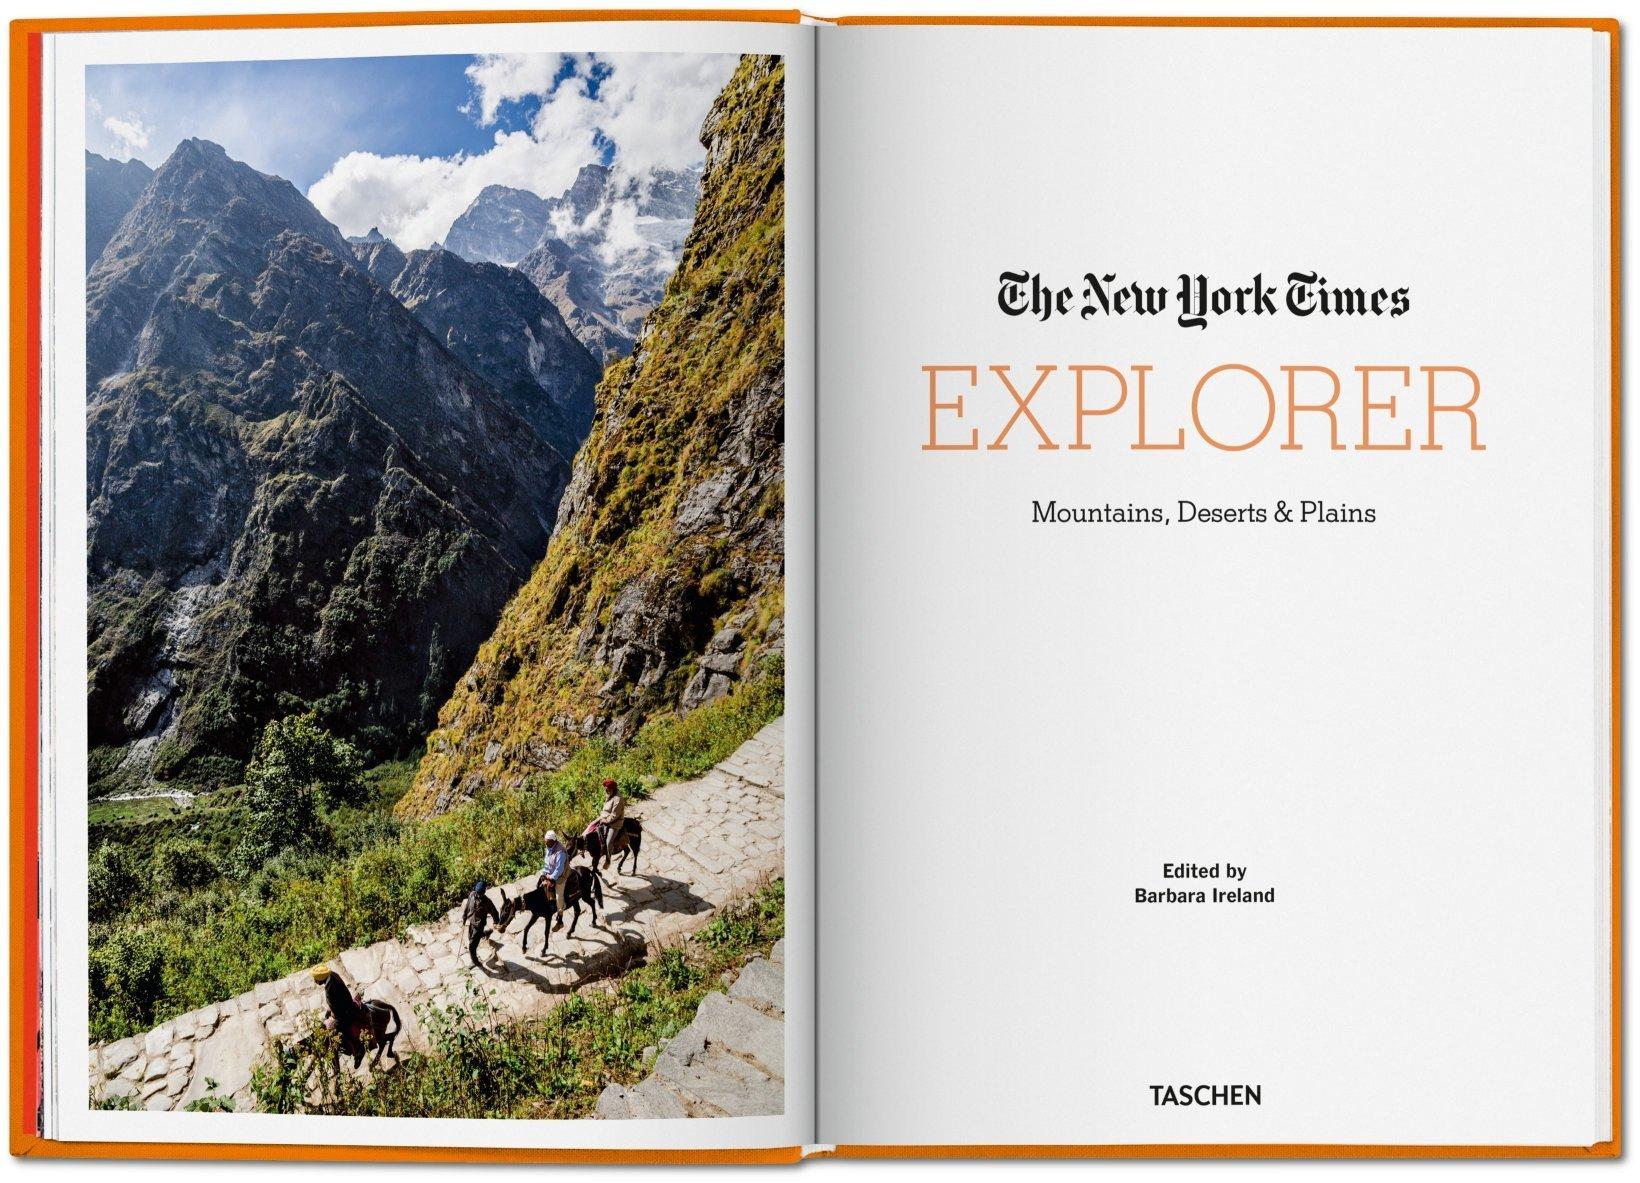 ju-nyt_explorer_mountains_deserts-image_03_08705.jpg